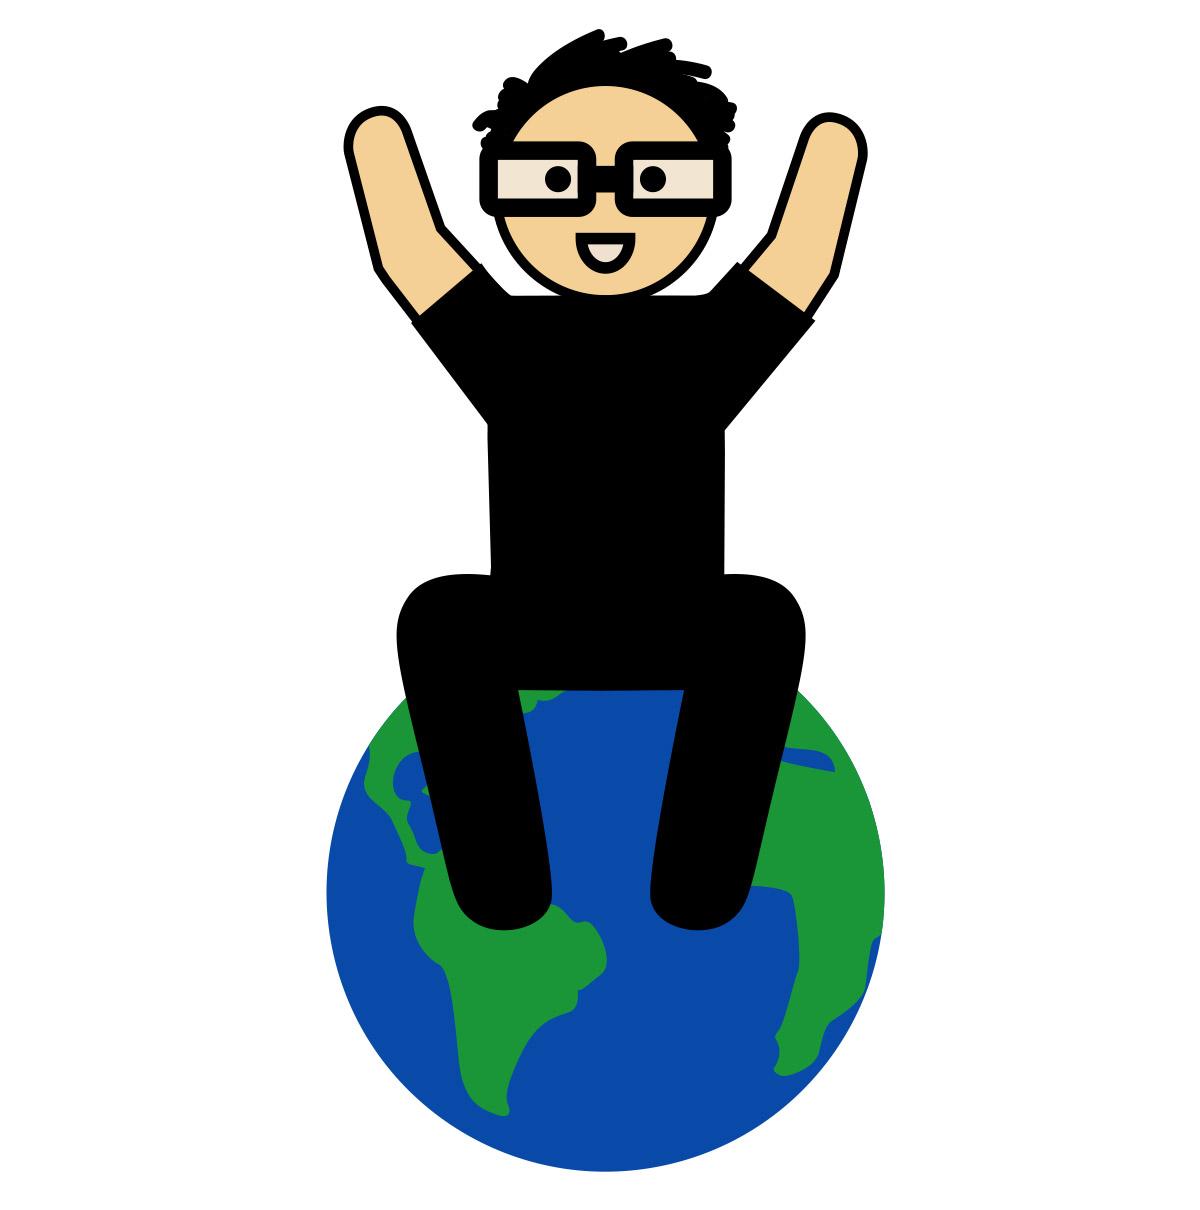 Eric kim global